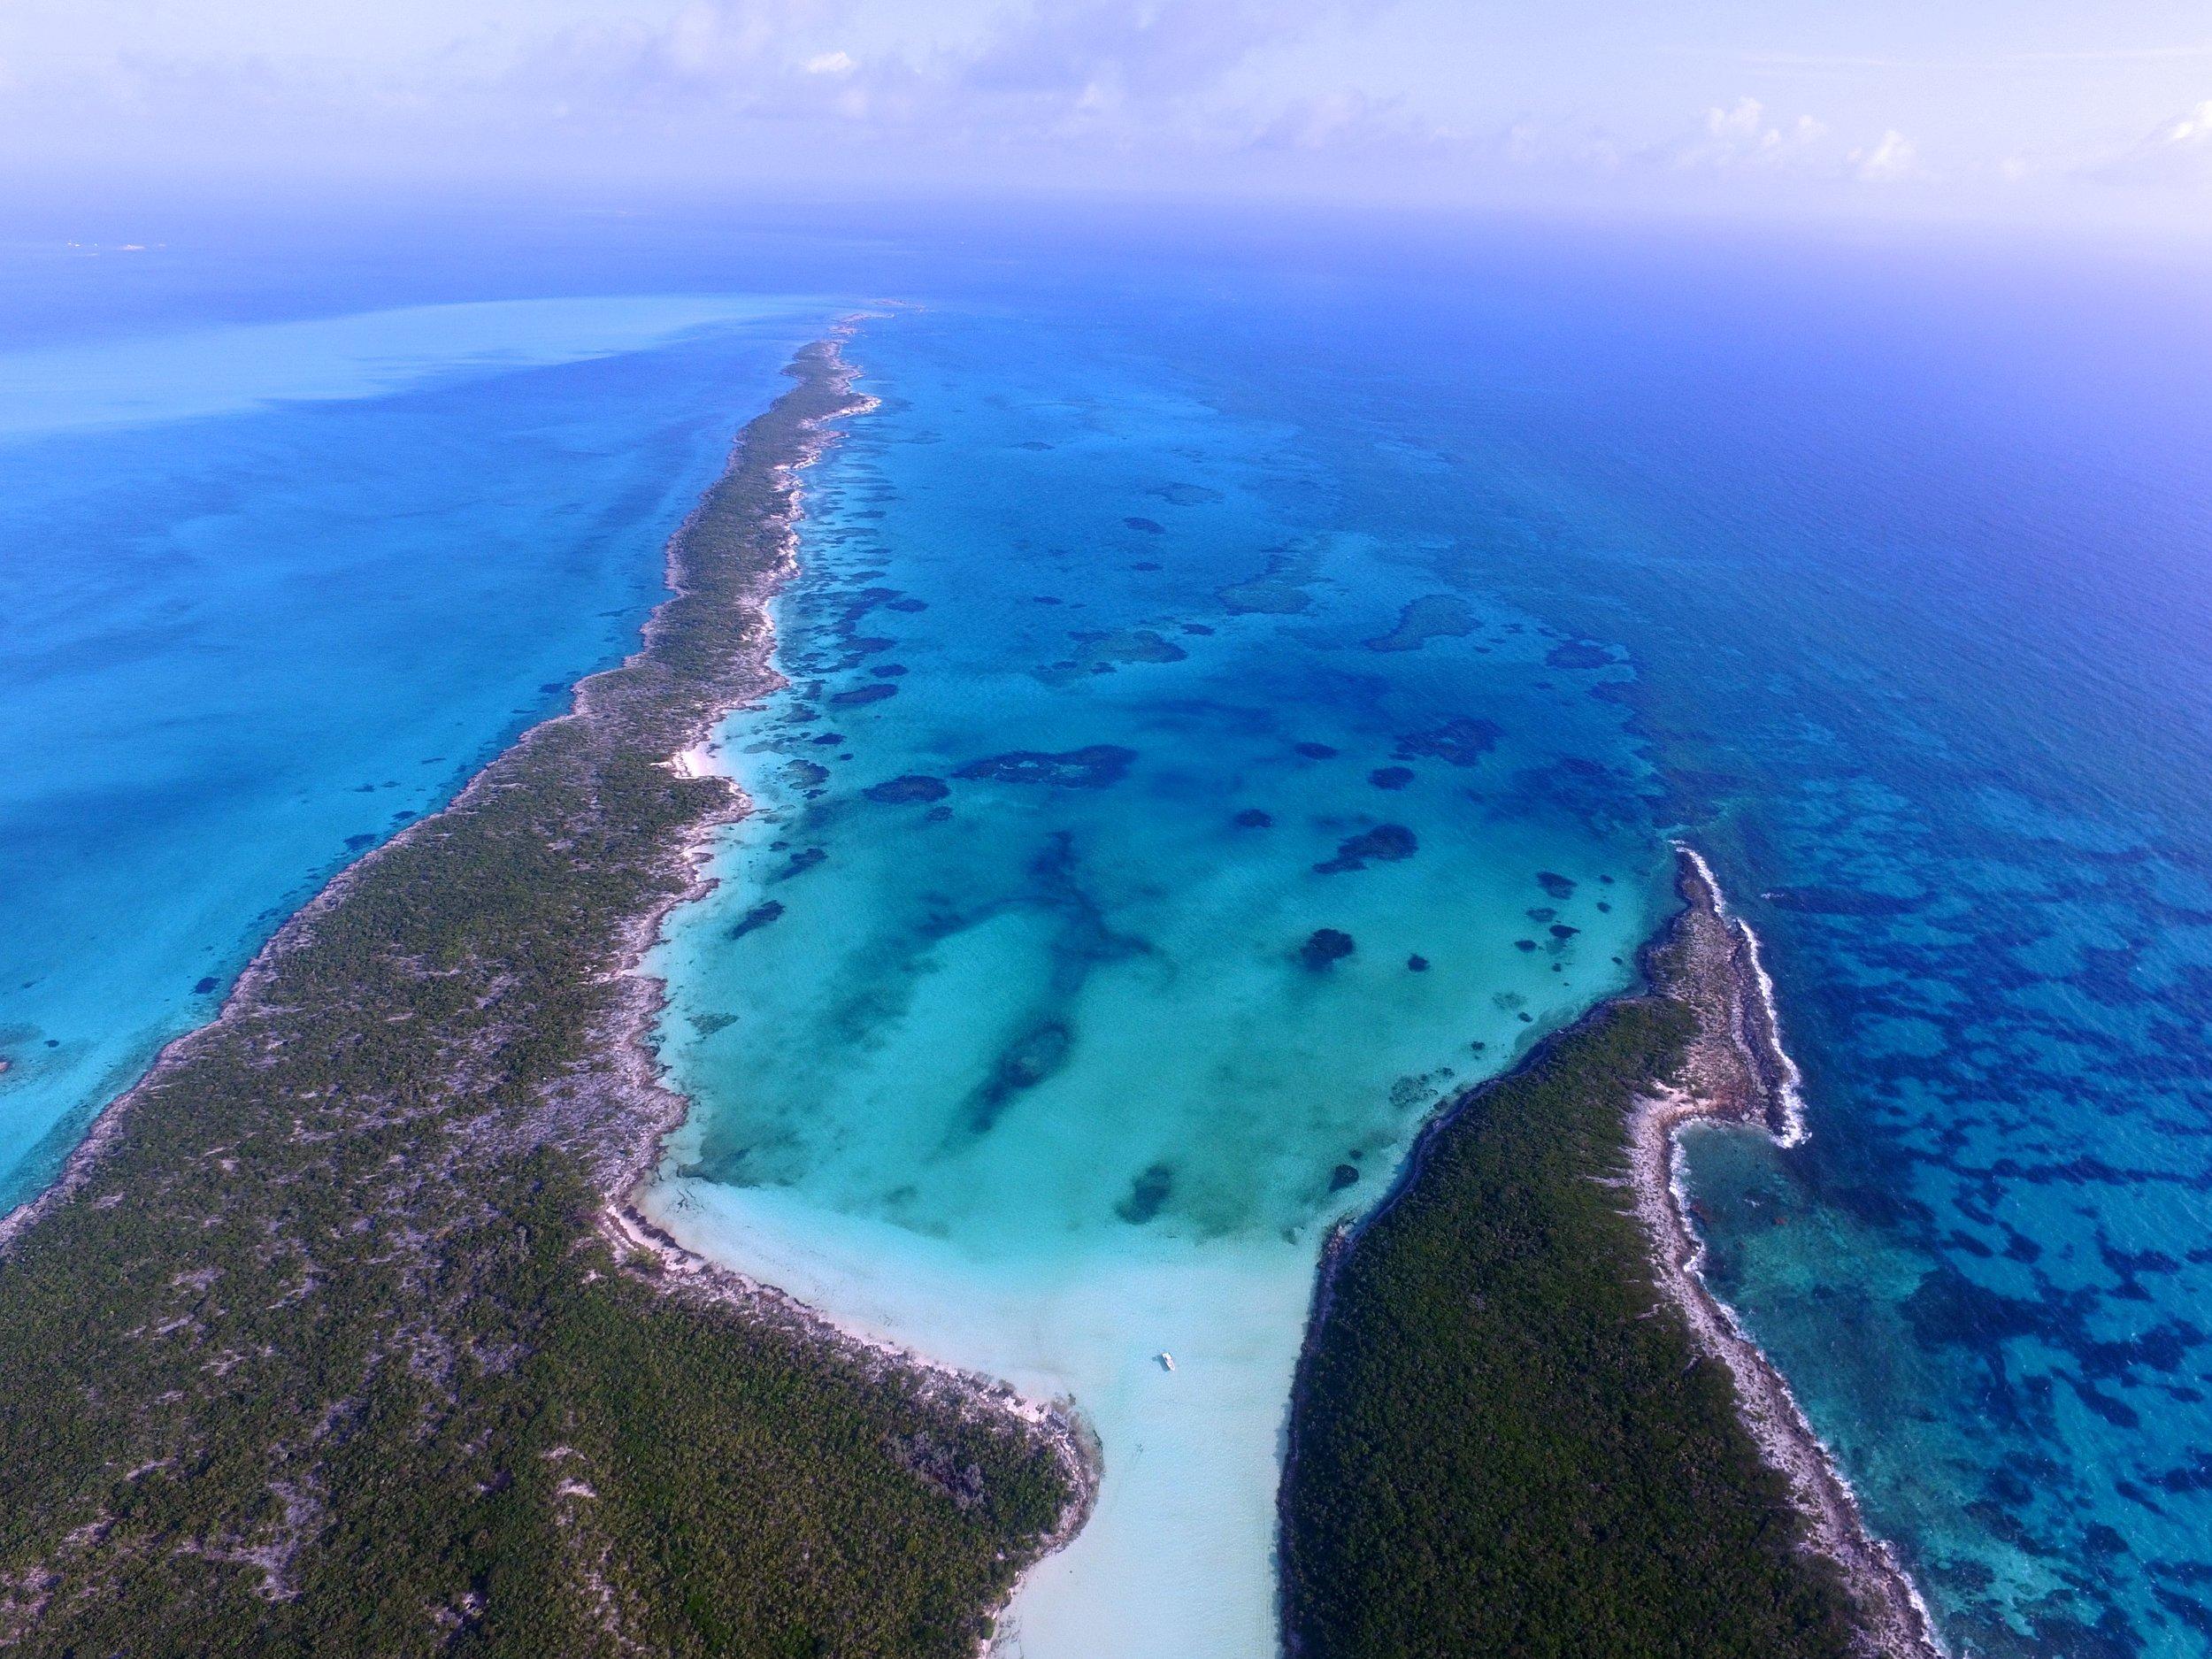 Ship Channel Cay Reefs - Exuma Cays 2016